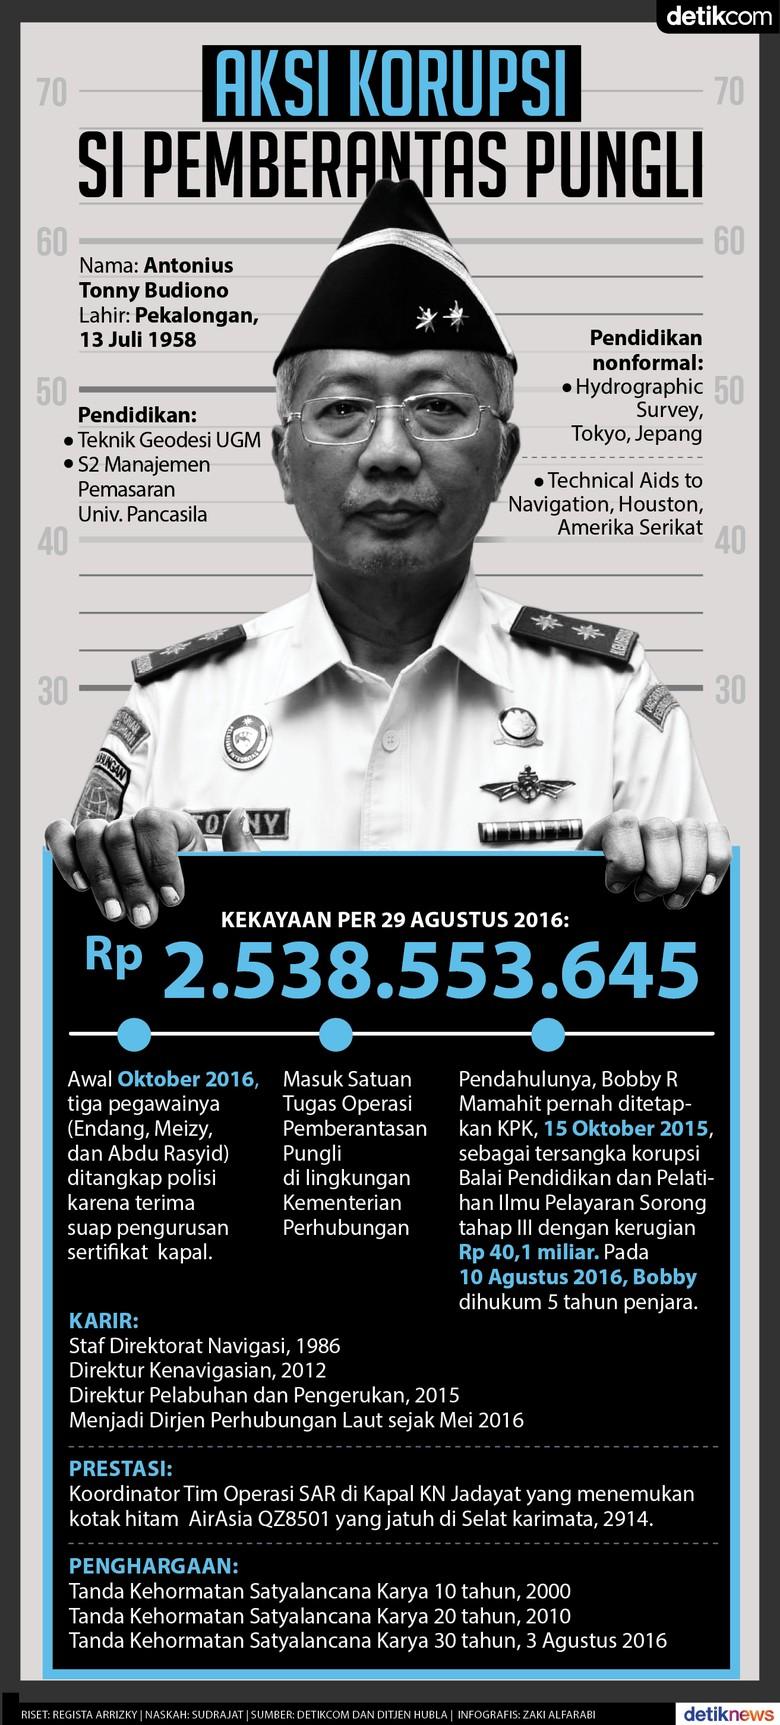 Aksi Korupsi Si Pemberantas Pungli